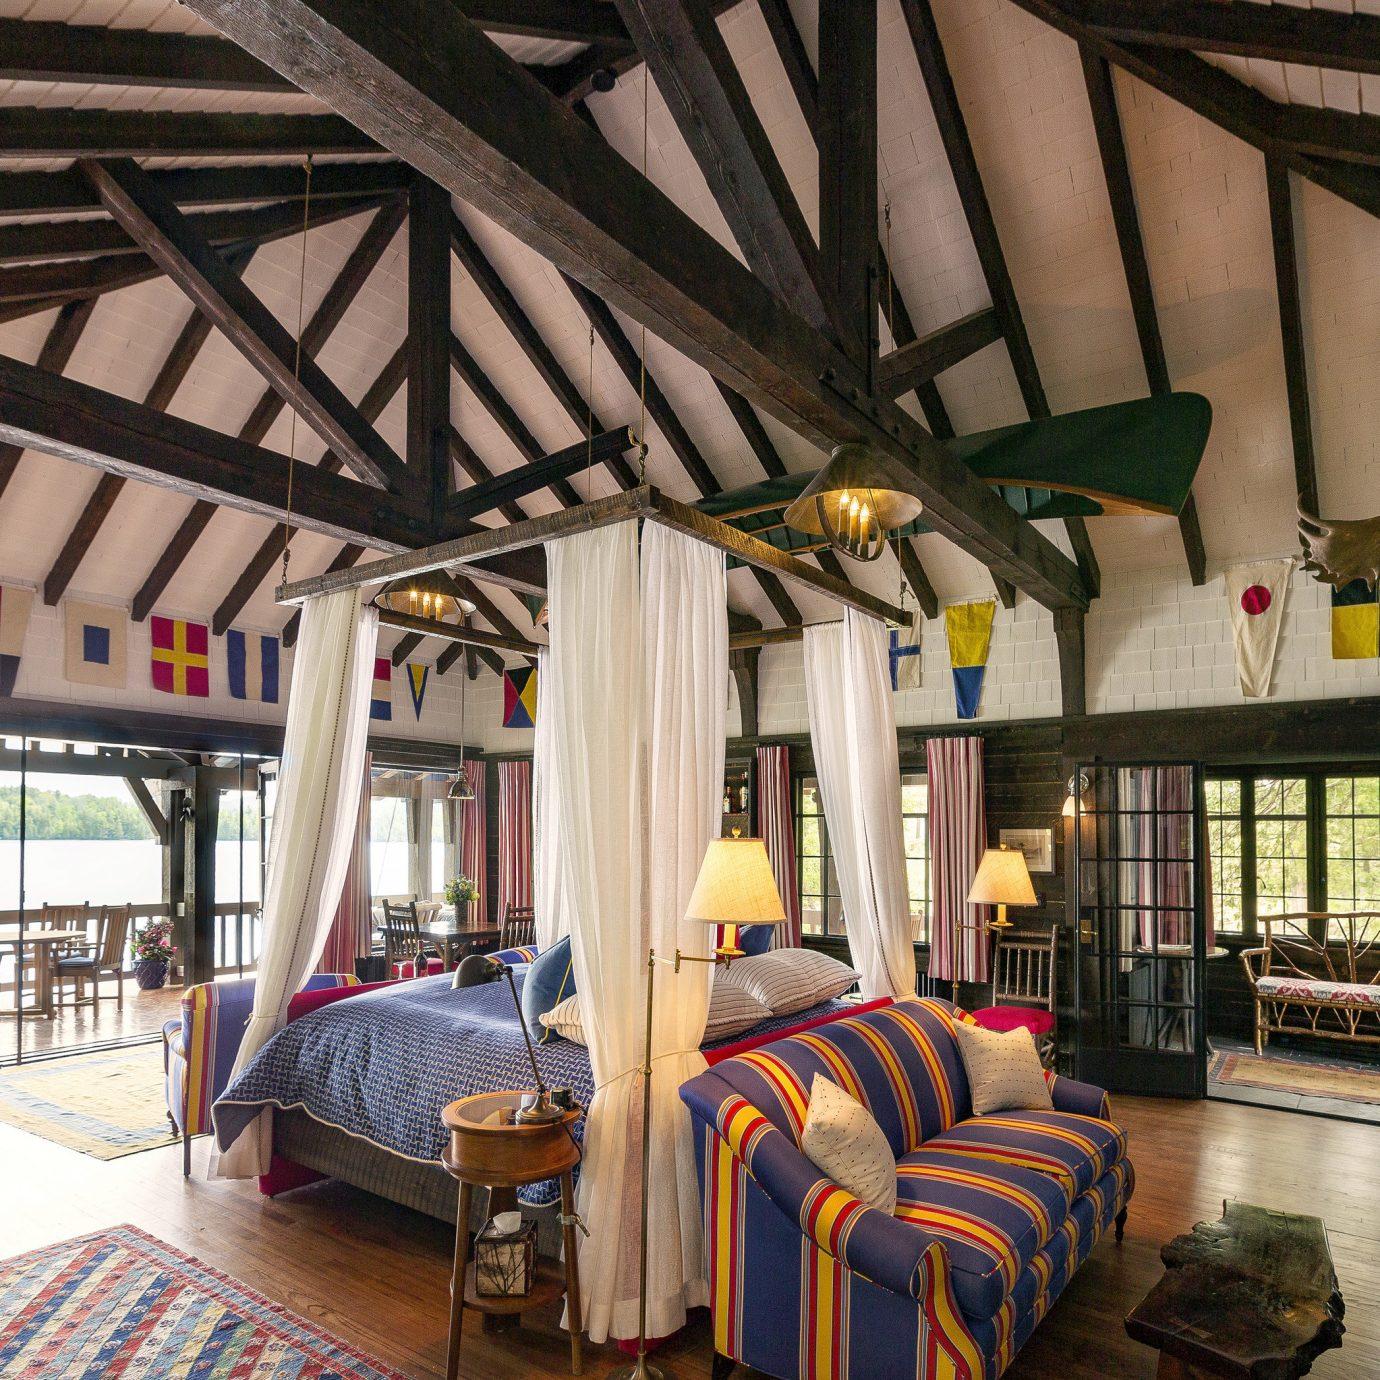 Boutique Hotels Hotels Outdoors + Adventure Secret Getaways Trip Ideas Weekend Getaways